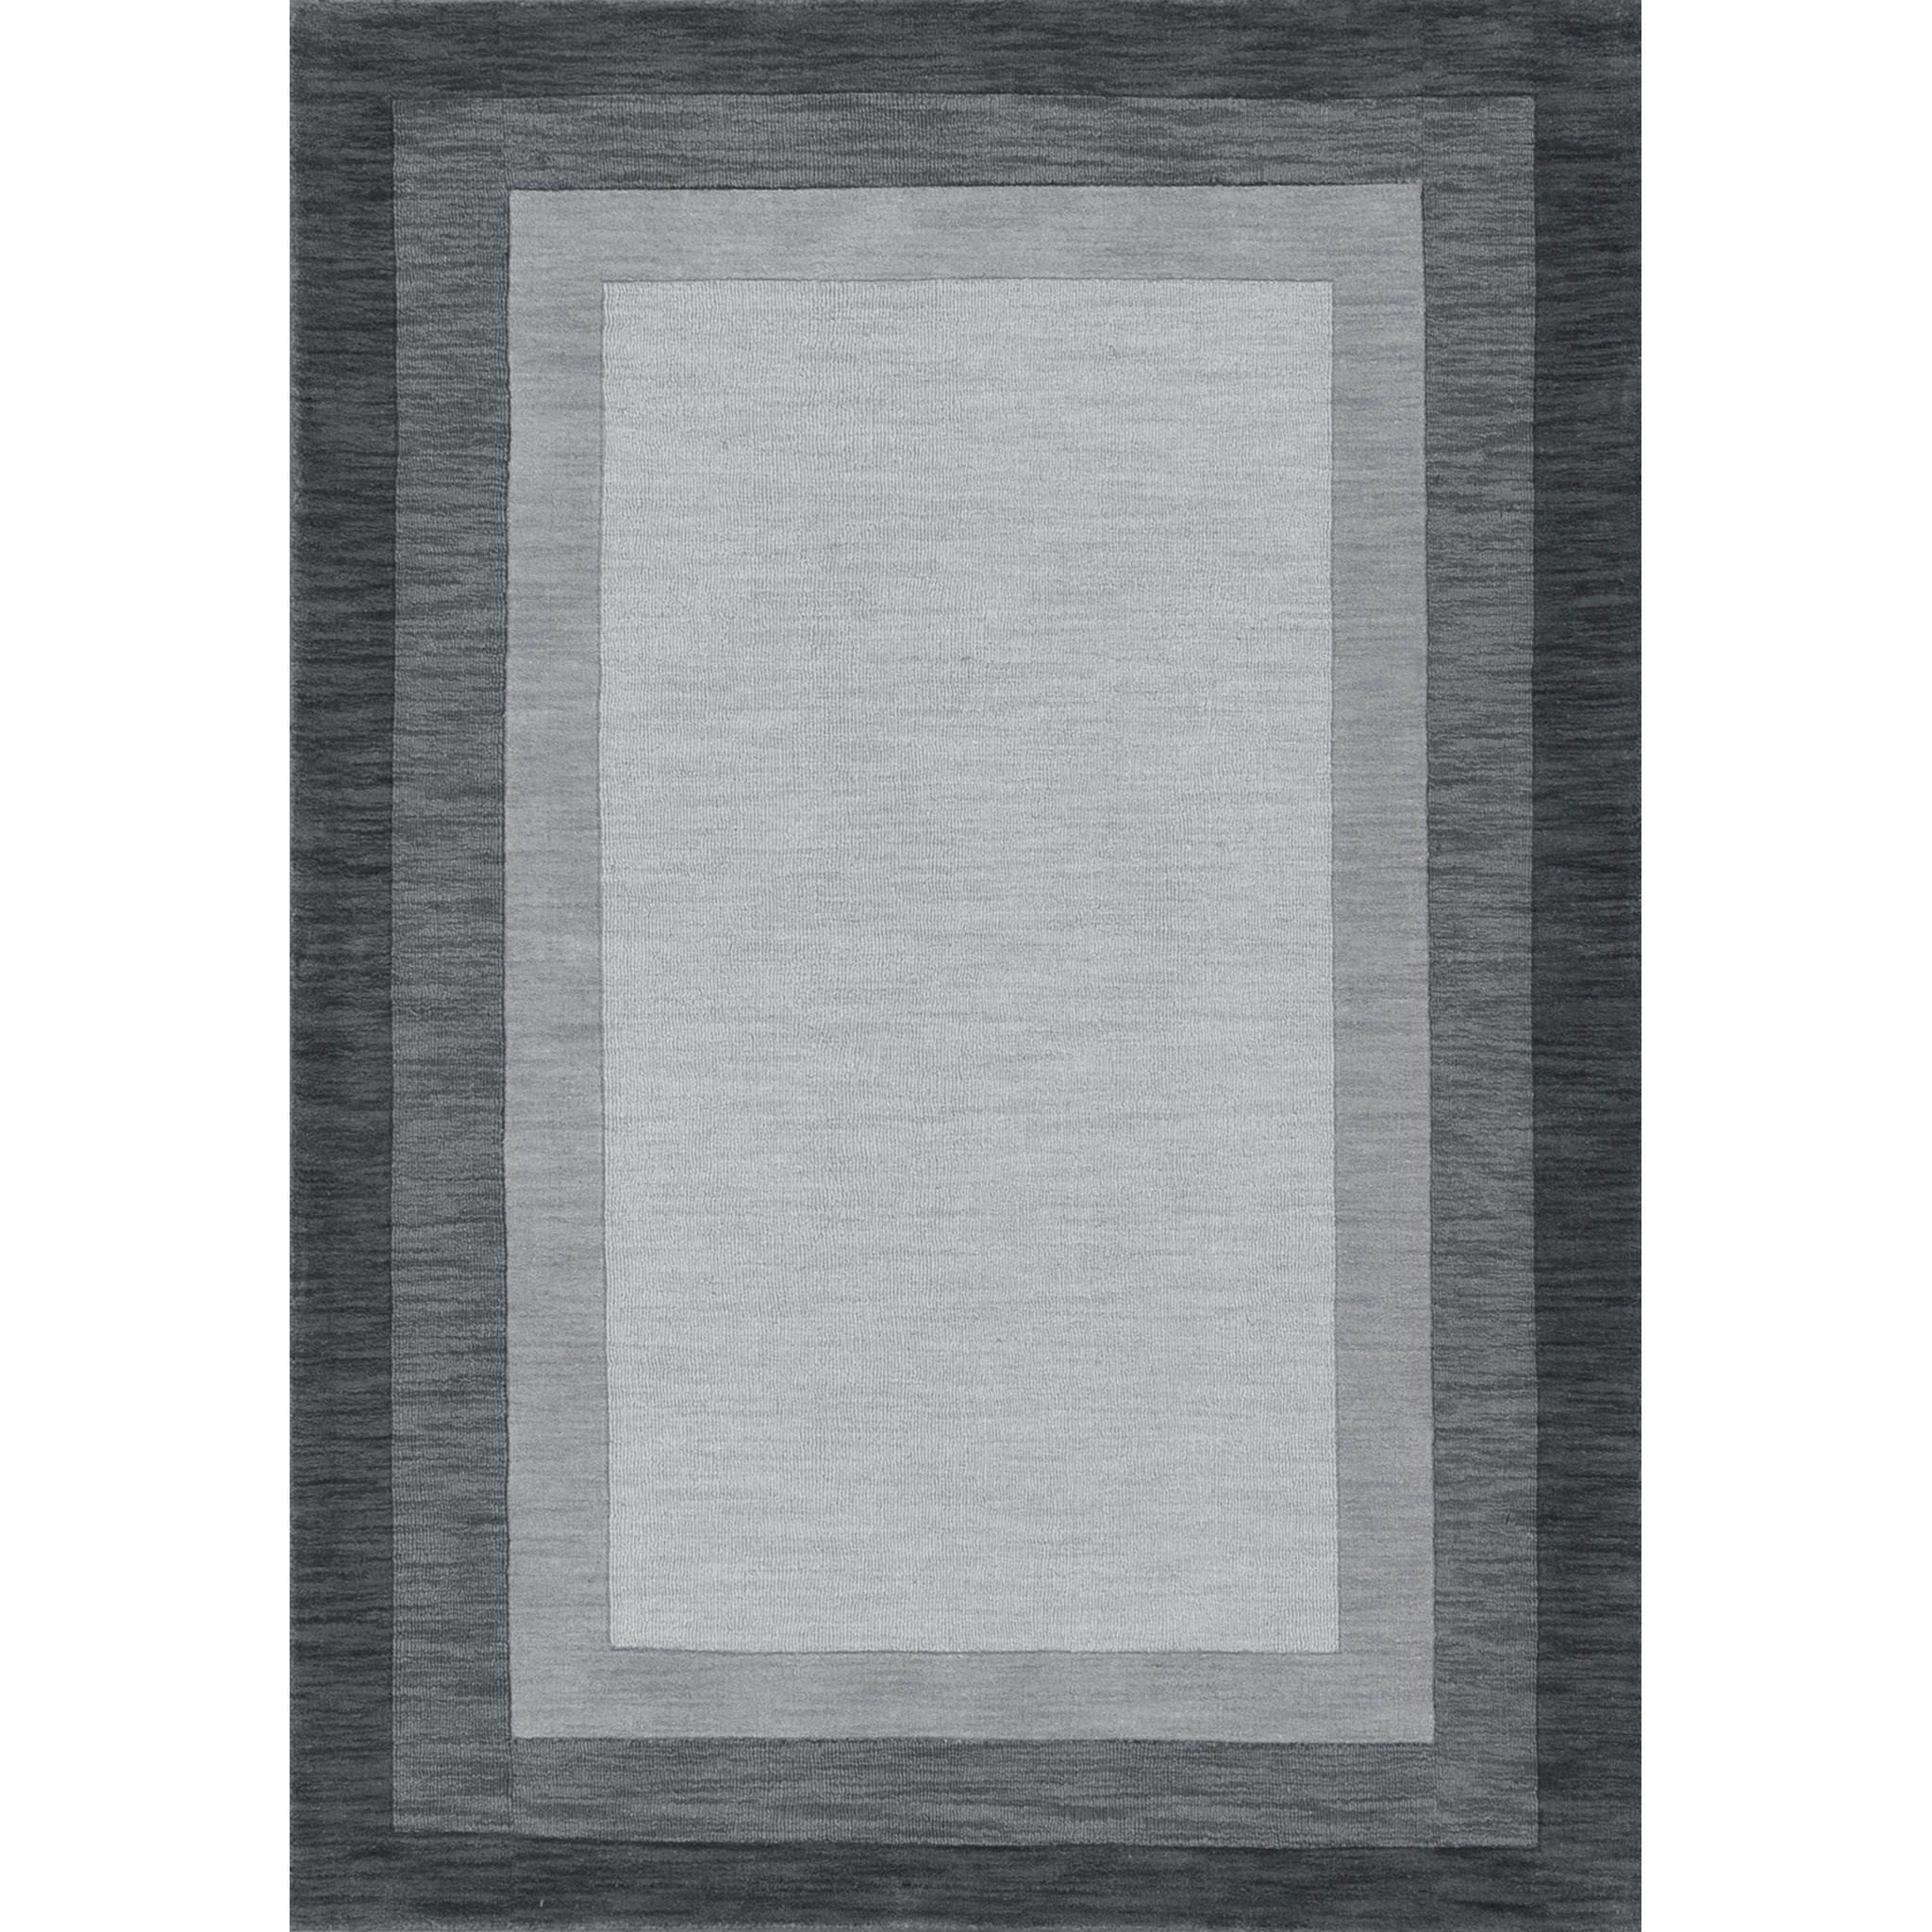 "Hamilton 7'-10"" x 11'-0"" Area Rug by Loloi Rugs at Virginia Furniture Market"